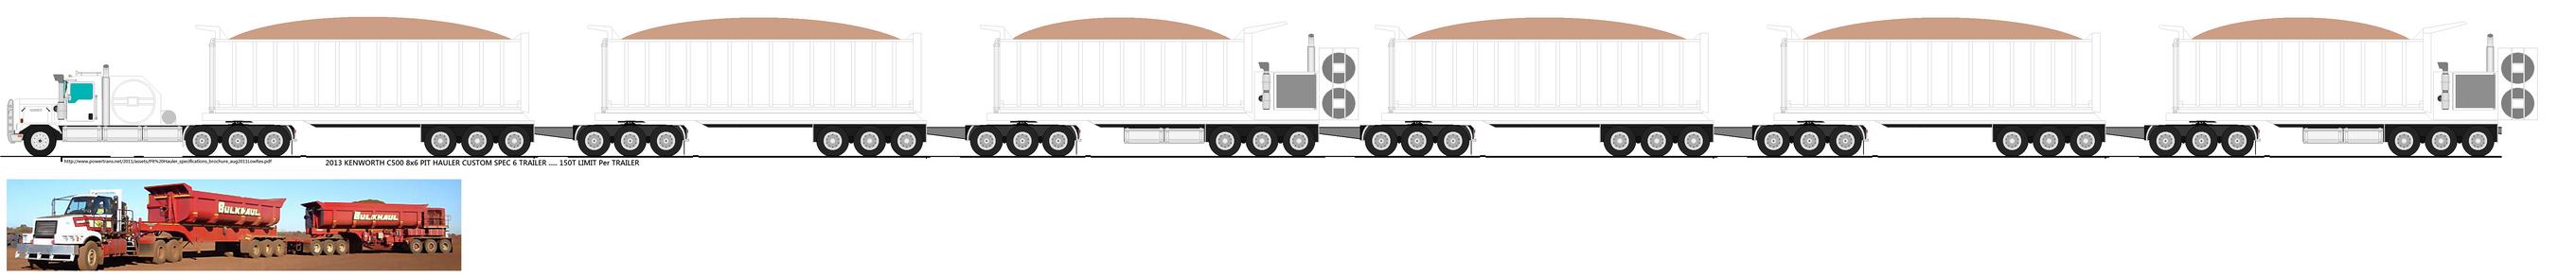 2013 Kenworth C500 Pit hauler by narutosdad